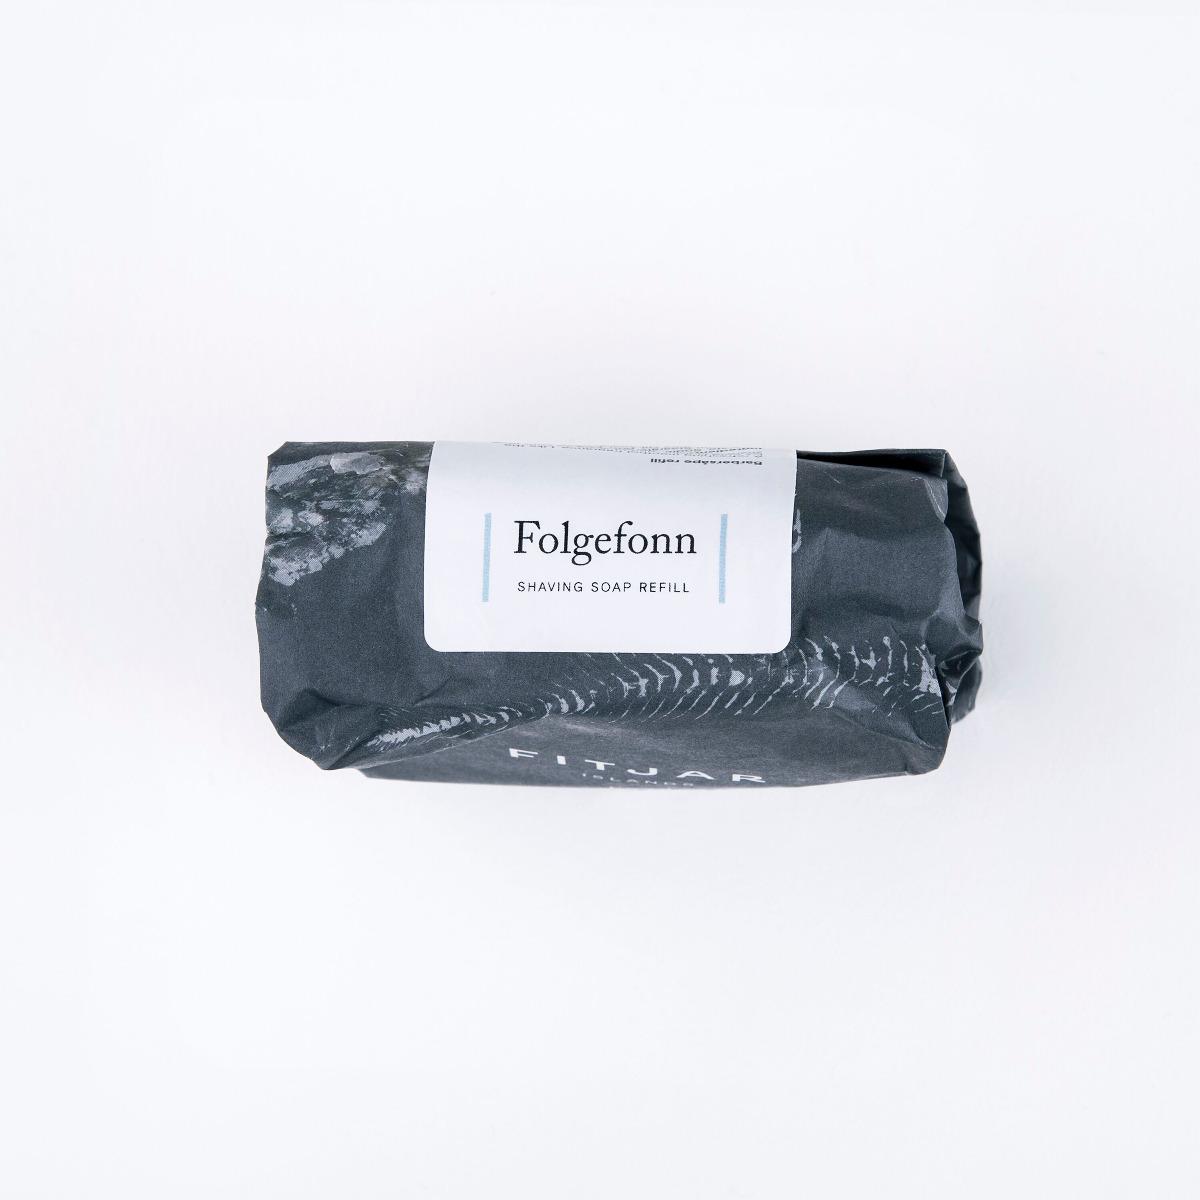 Fitjar Islands Folgefonn Shaving Soap 100g Refill